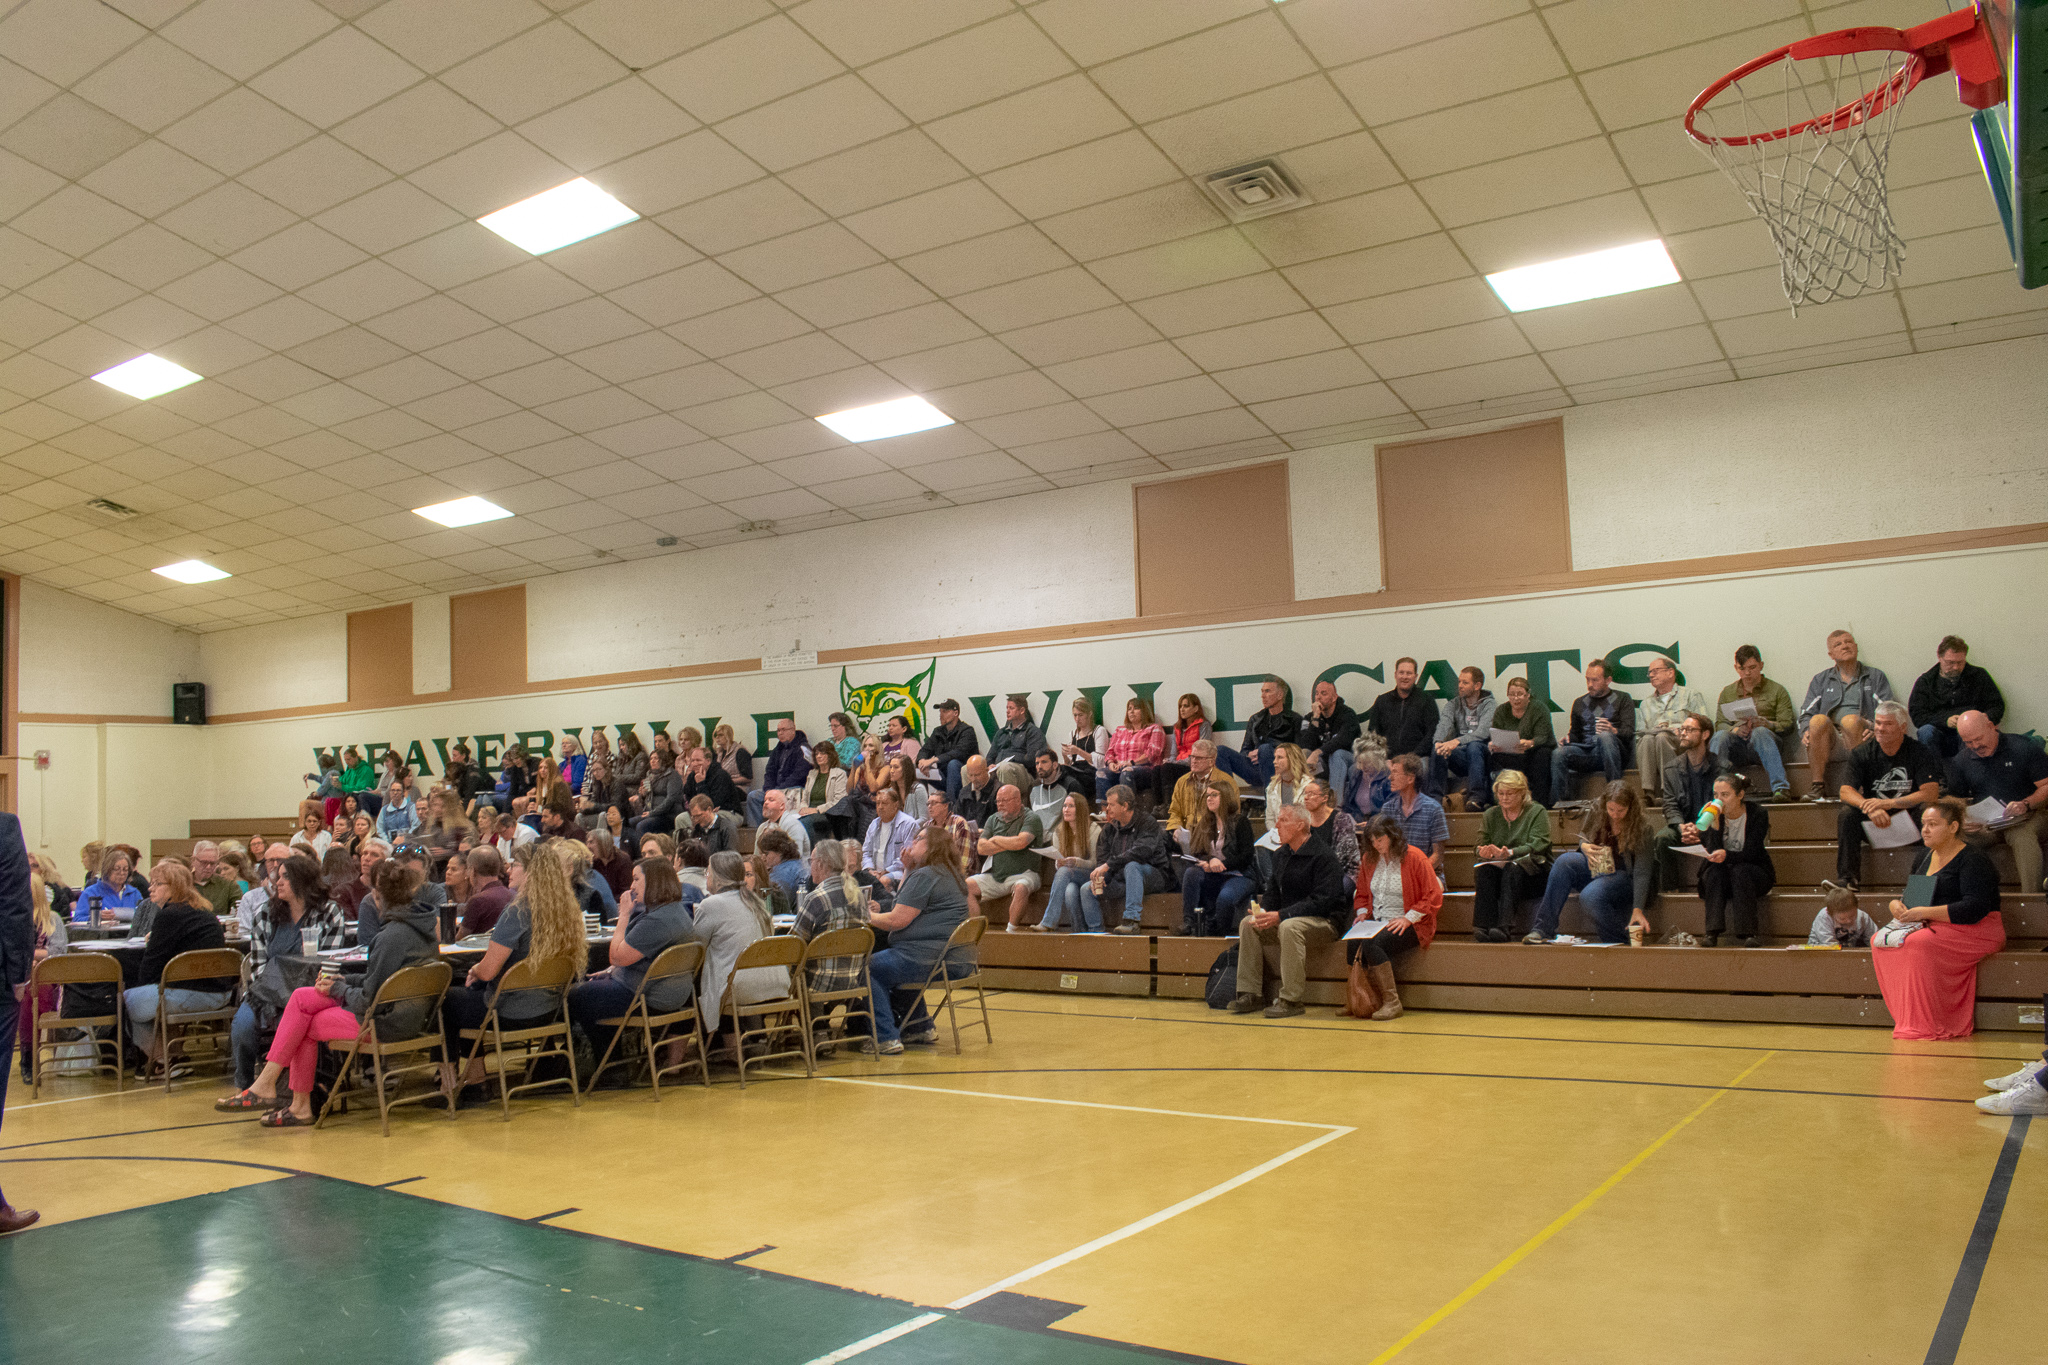 180 Educators gather for Professional Develpment